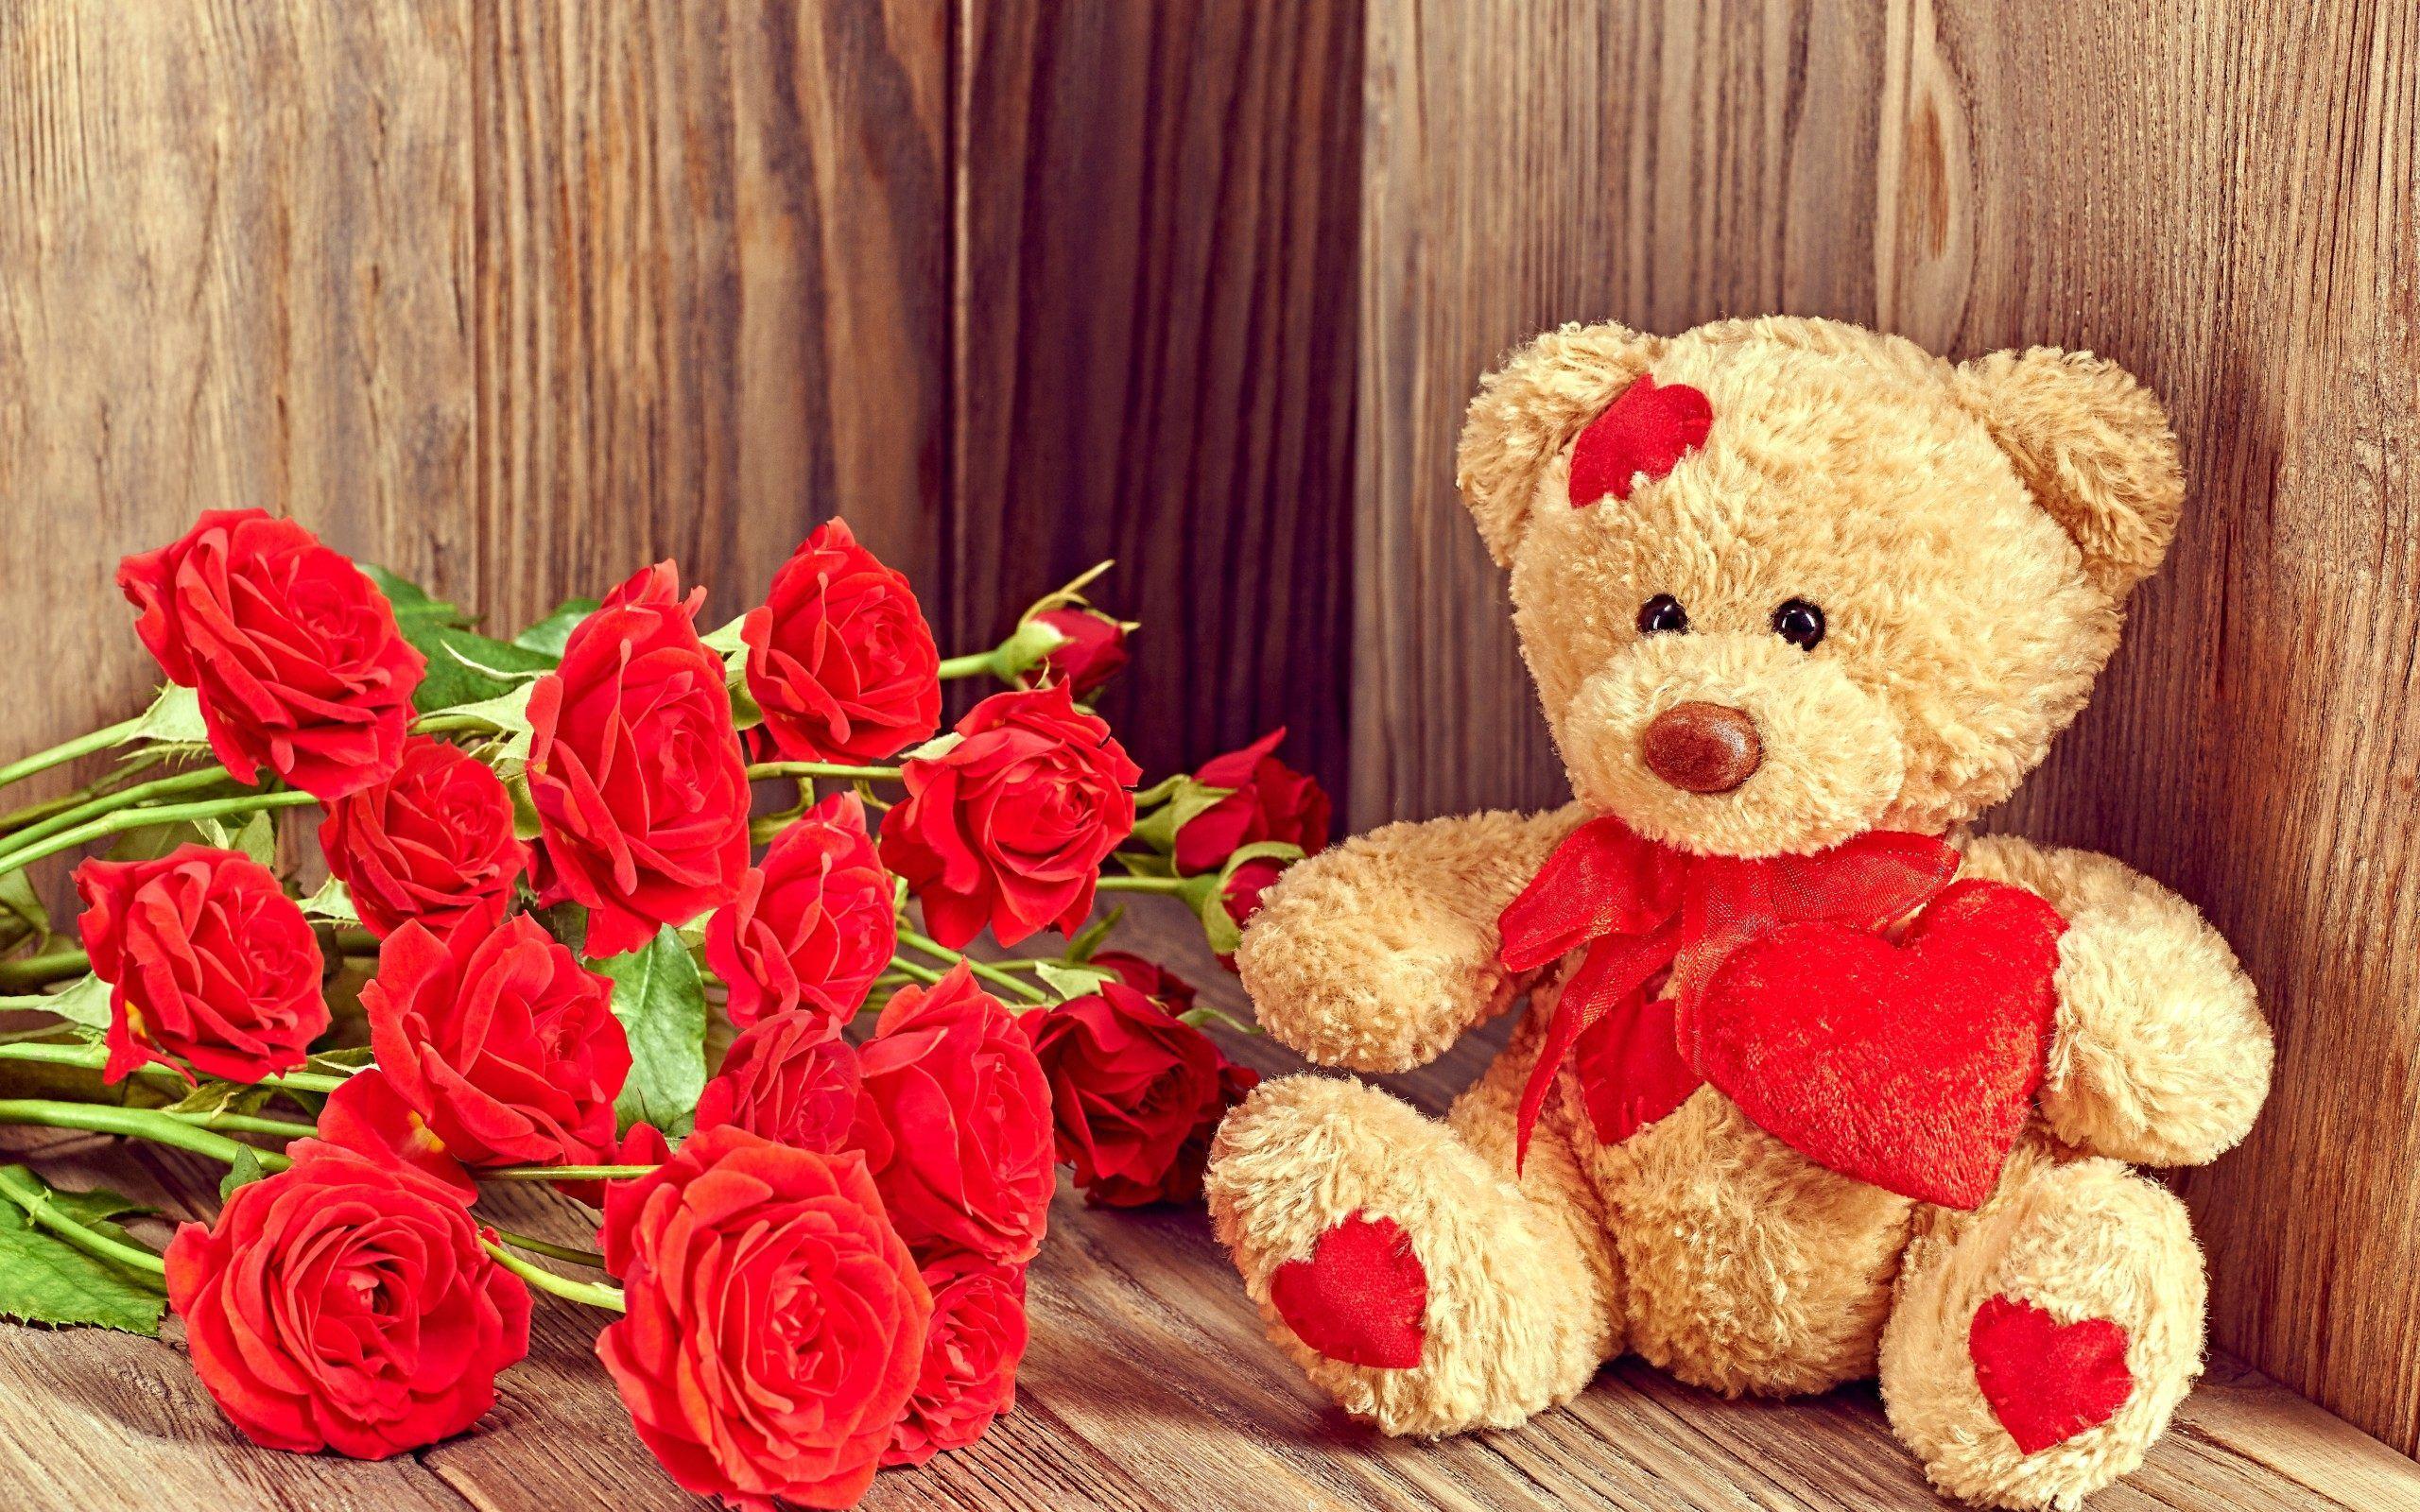 Red Roses Wallpaper Rose Wallpaper Wallpapers Pinterest